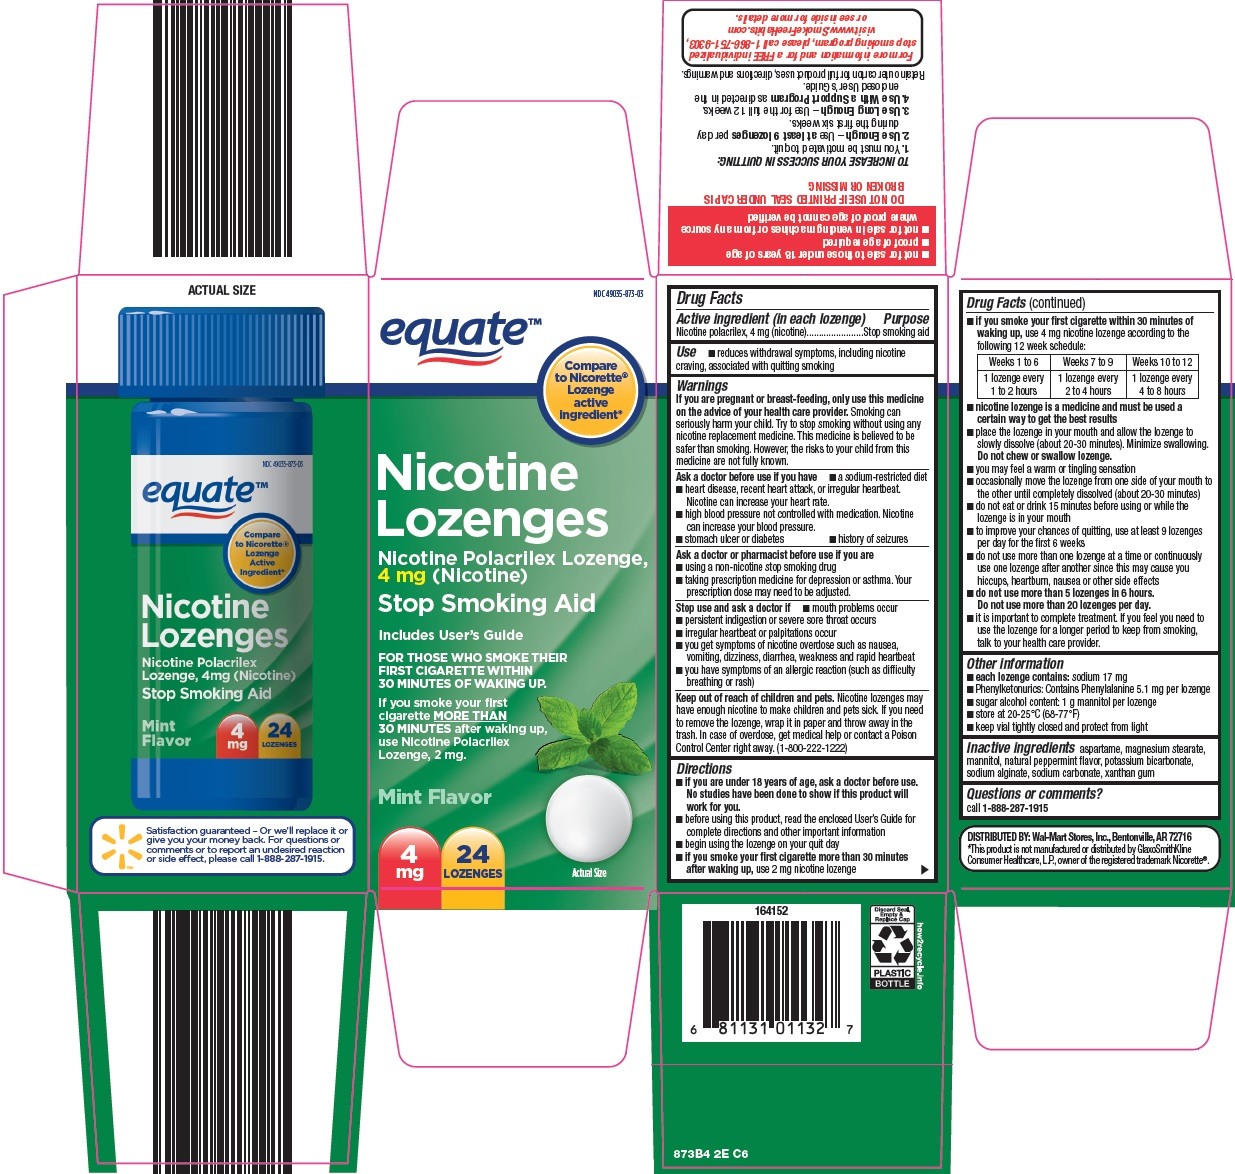 nicotine lozenges image